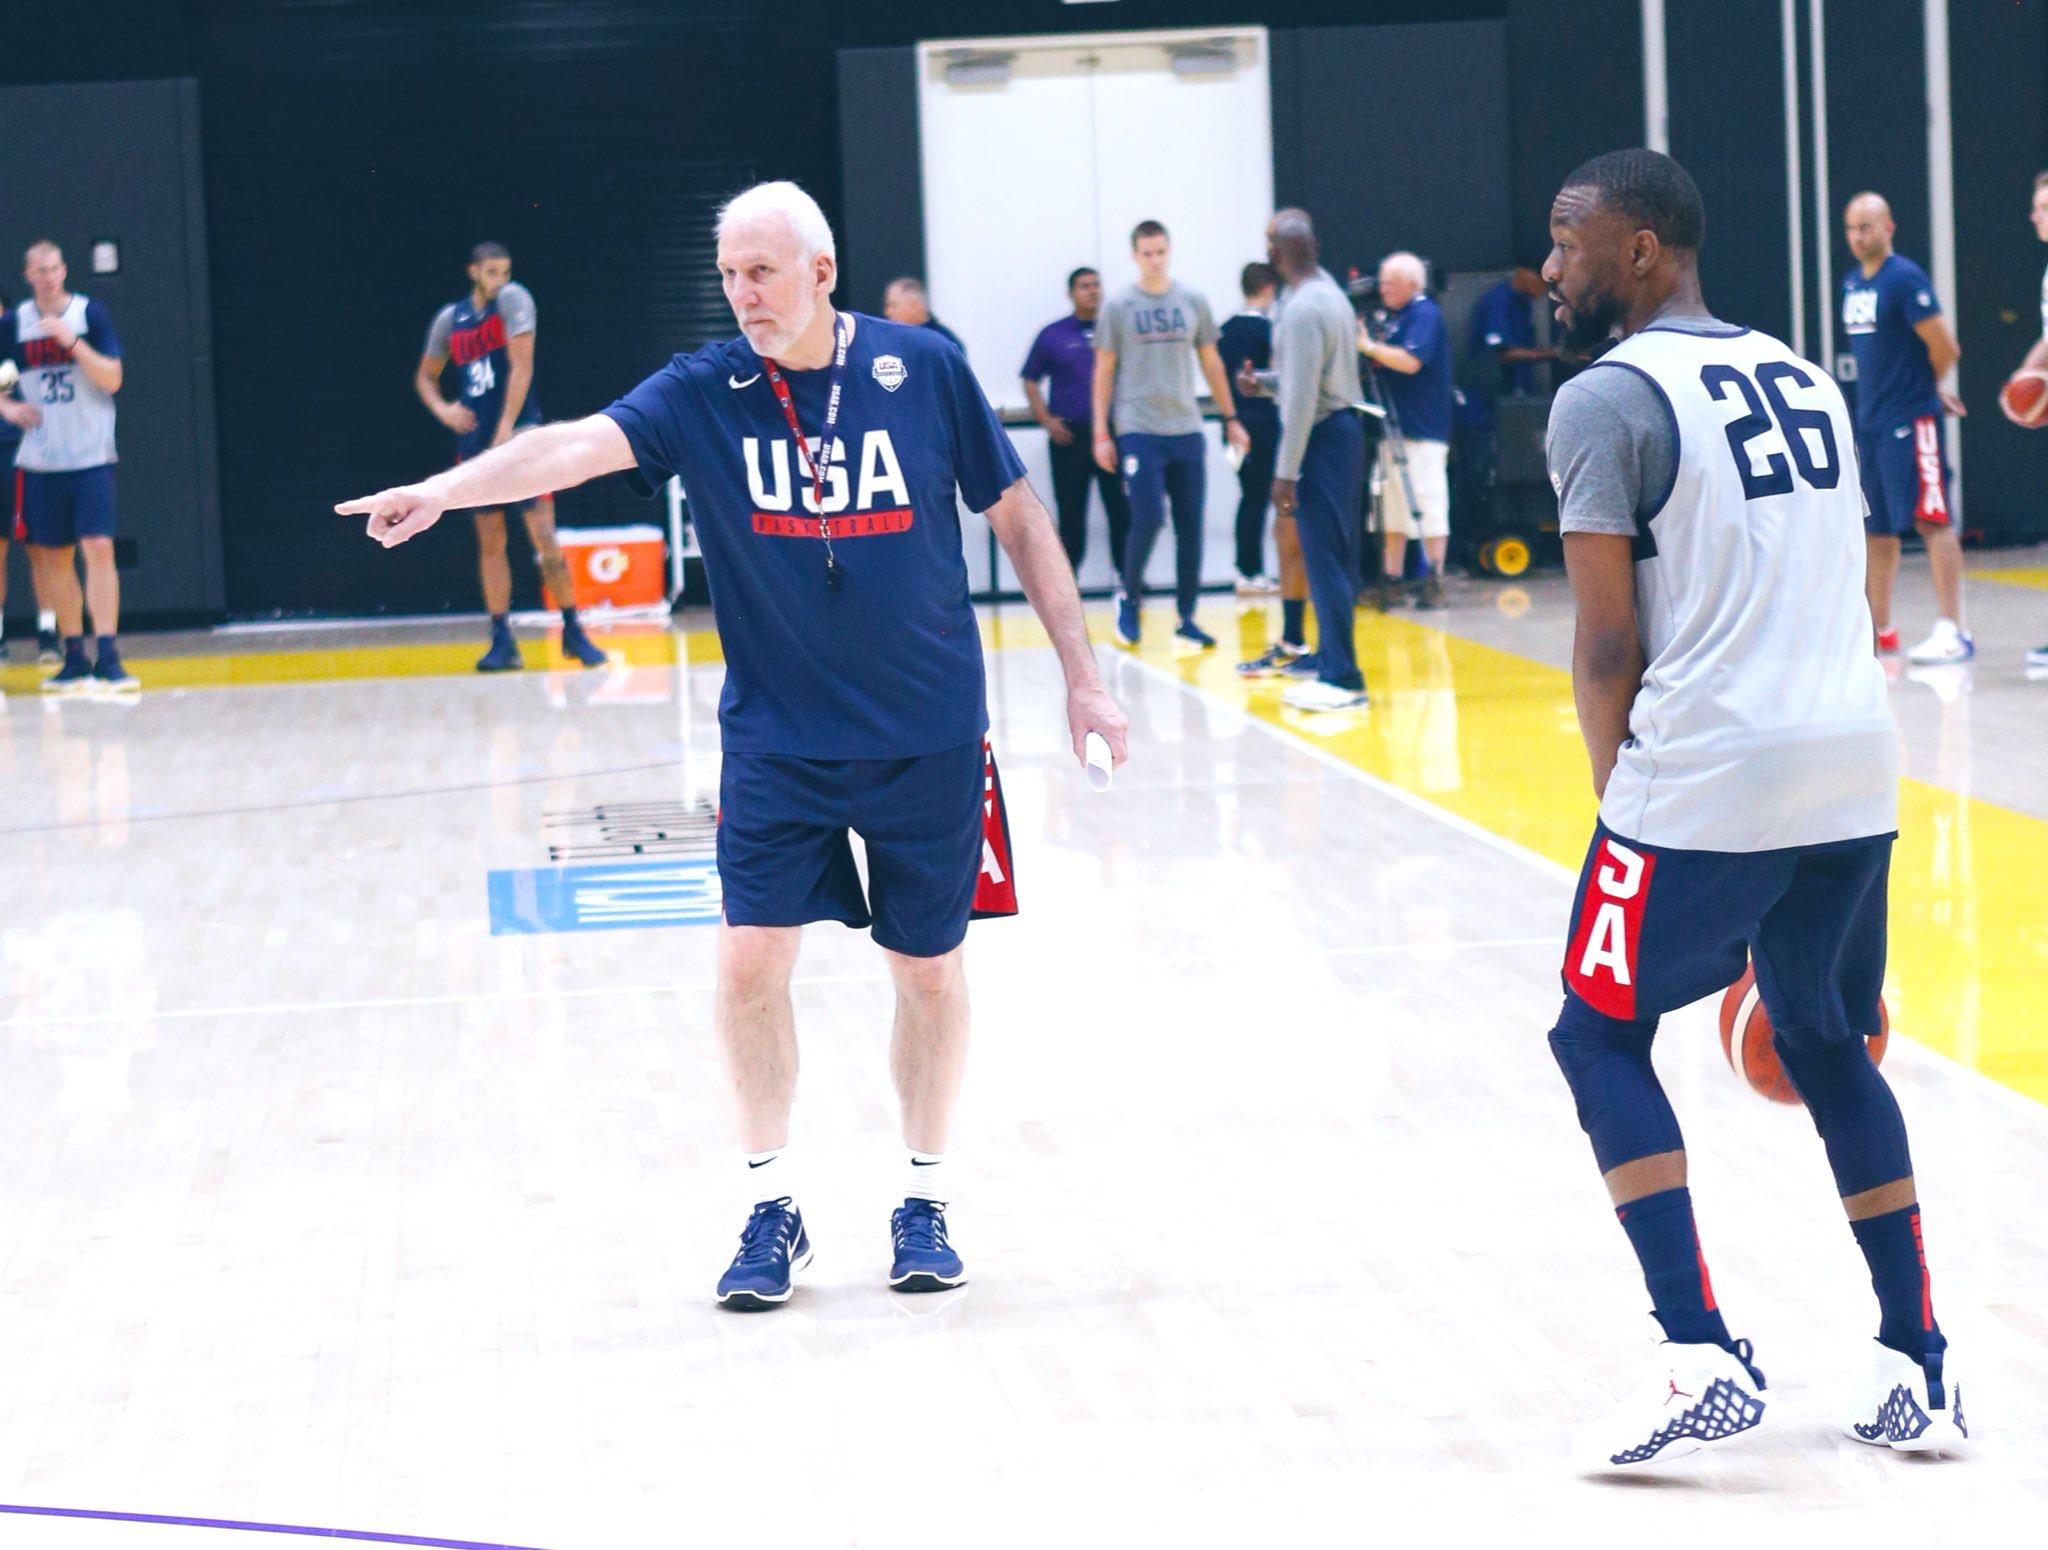 NBA官方发布美国男篮今日在洛杉矶训练组图